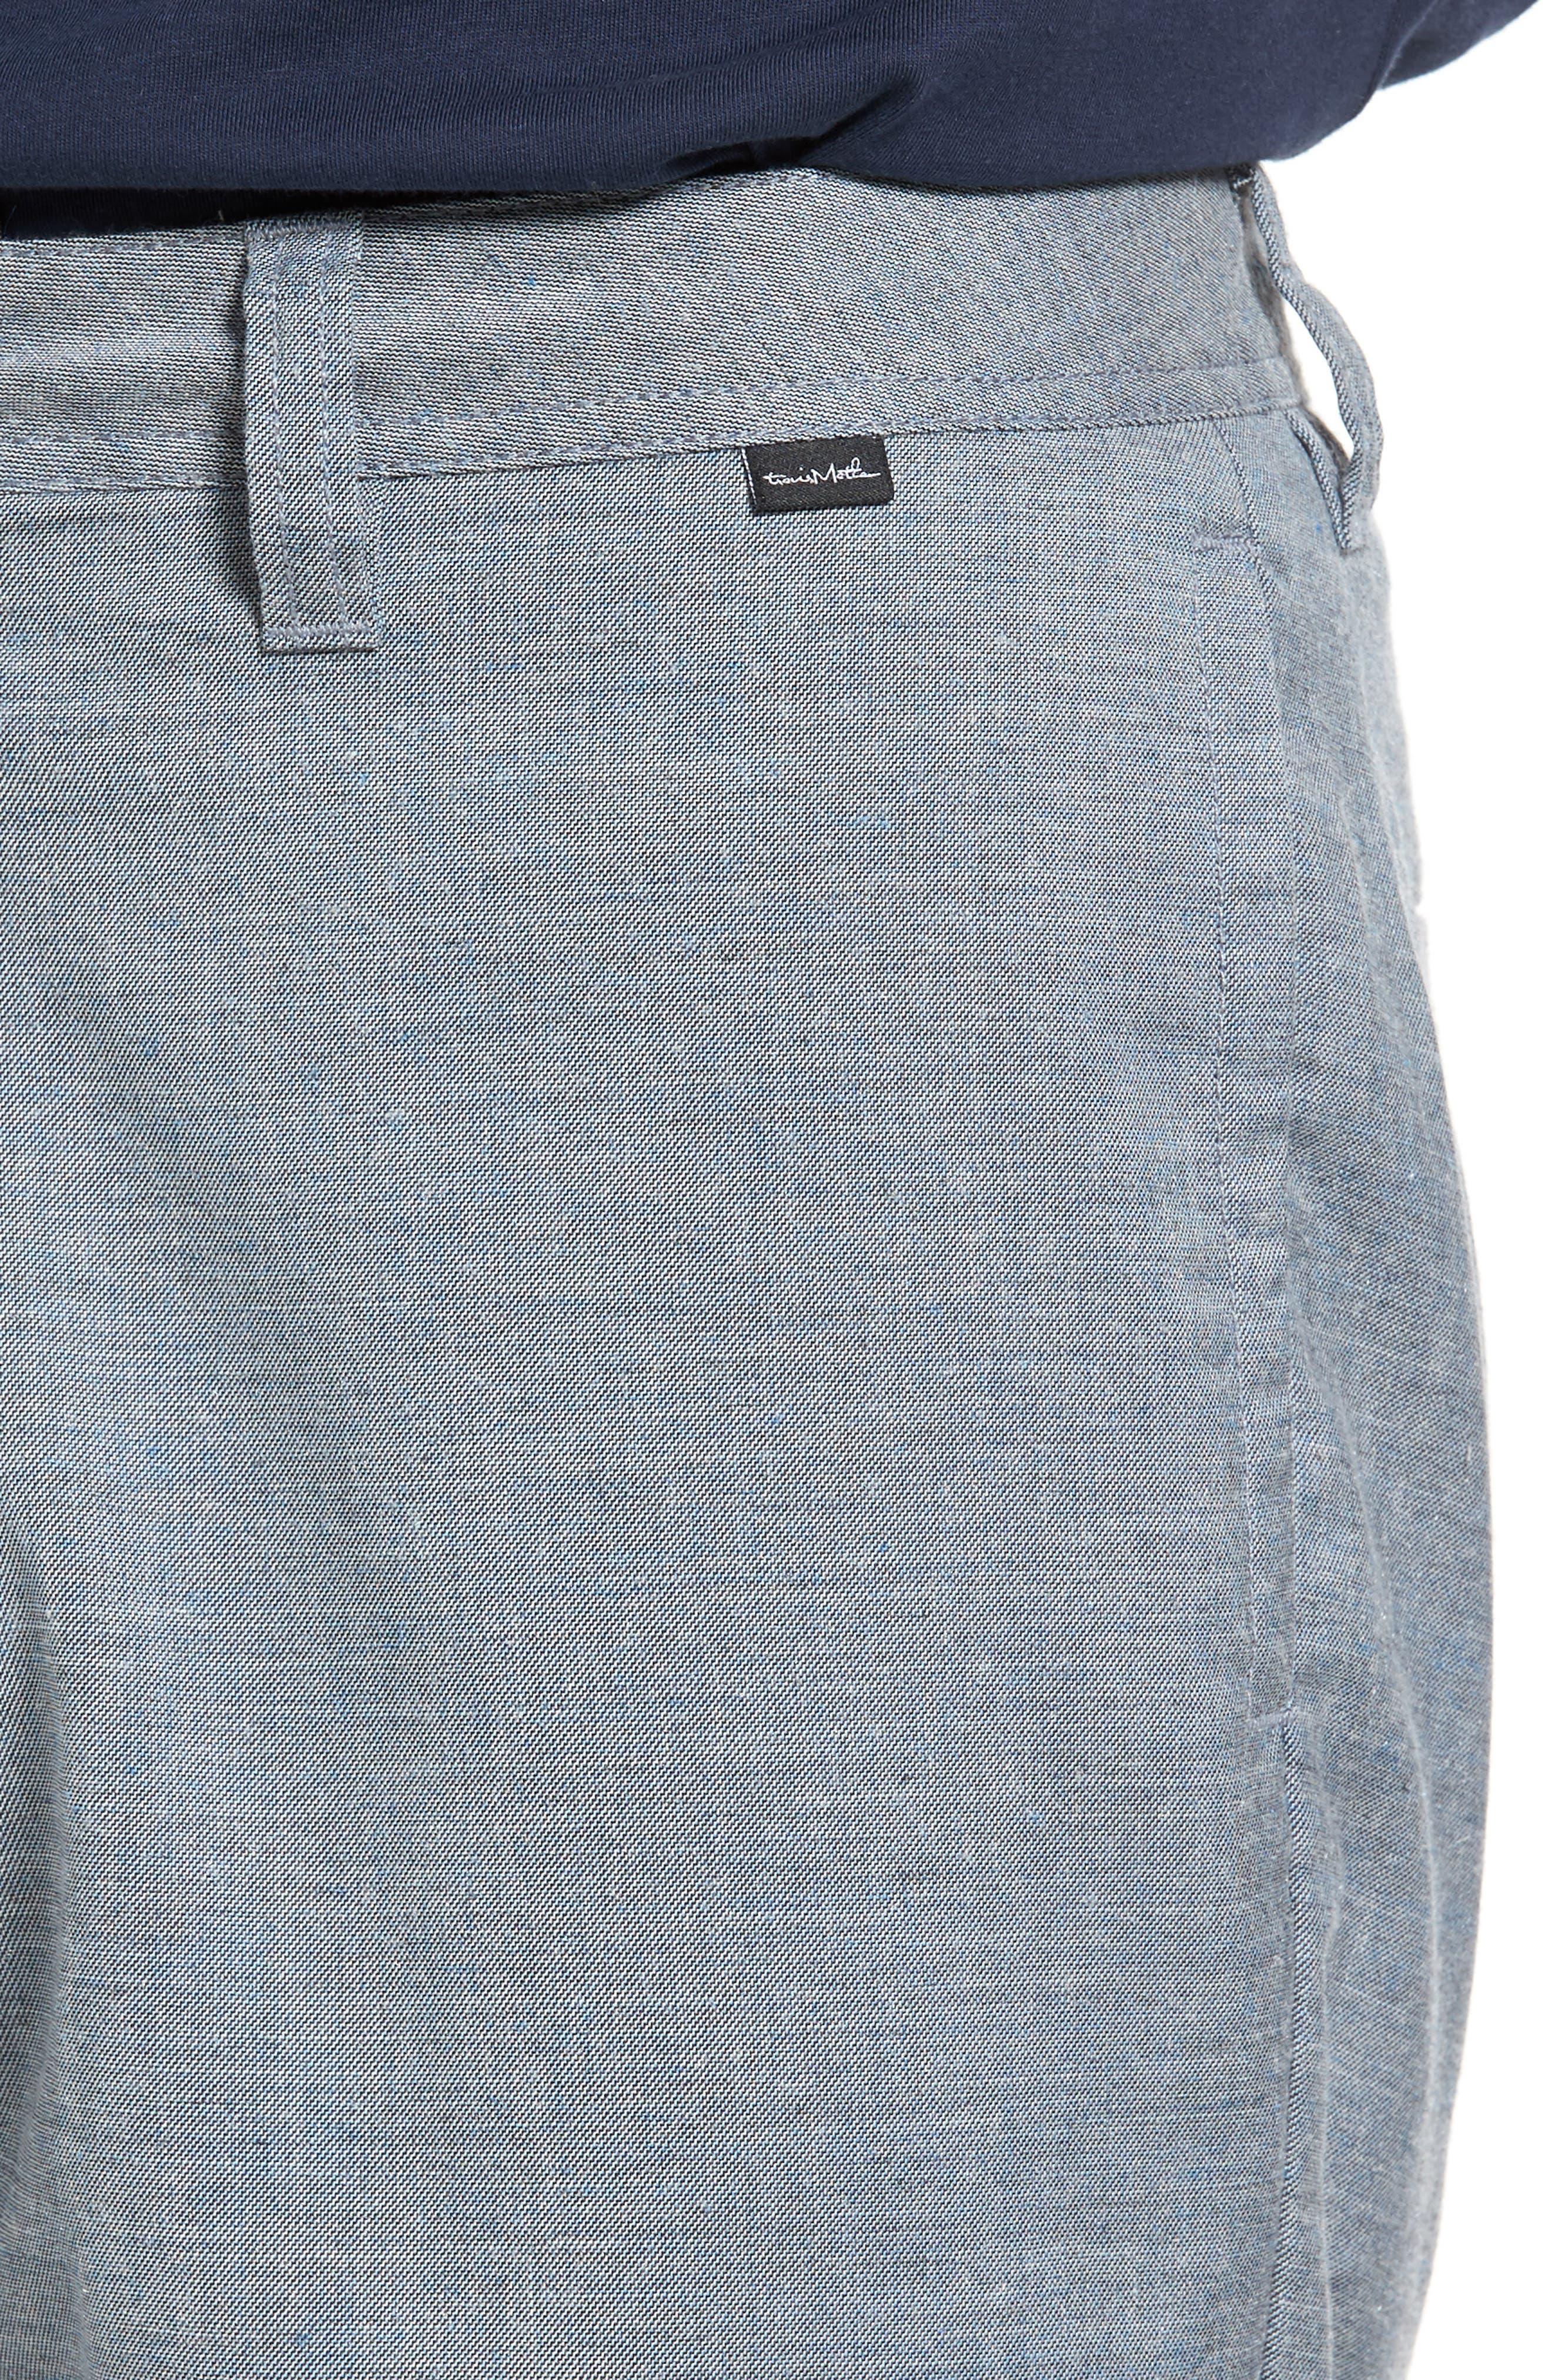 Alternate Image 4  - Travis Mathew Romers Stretch Shorts